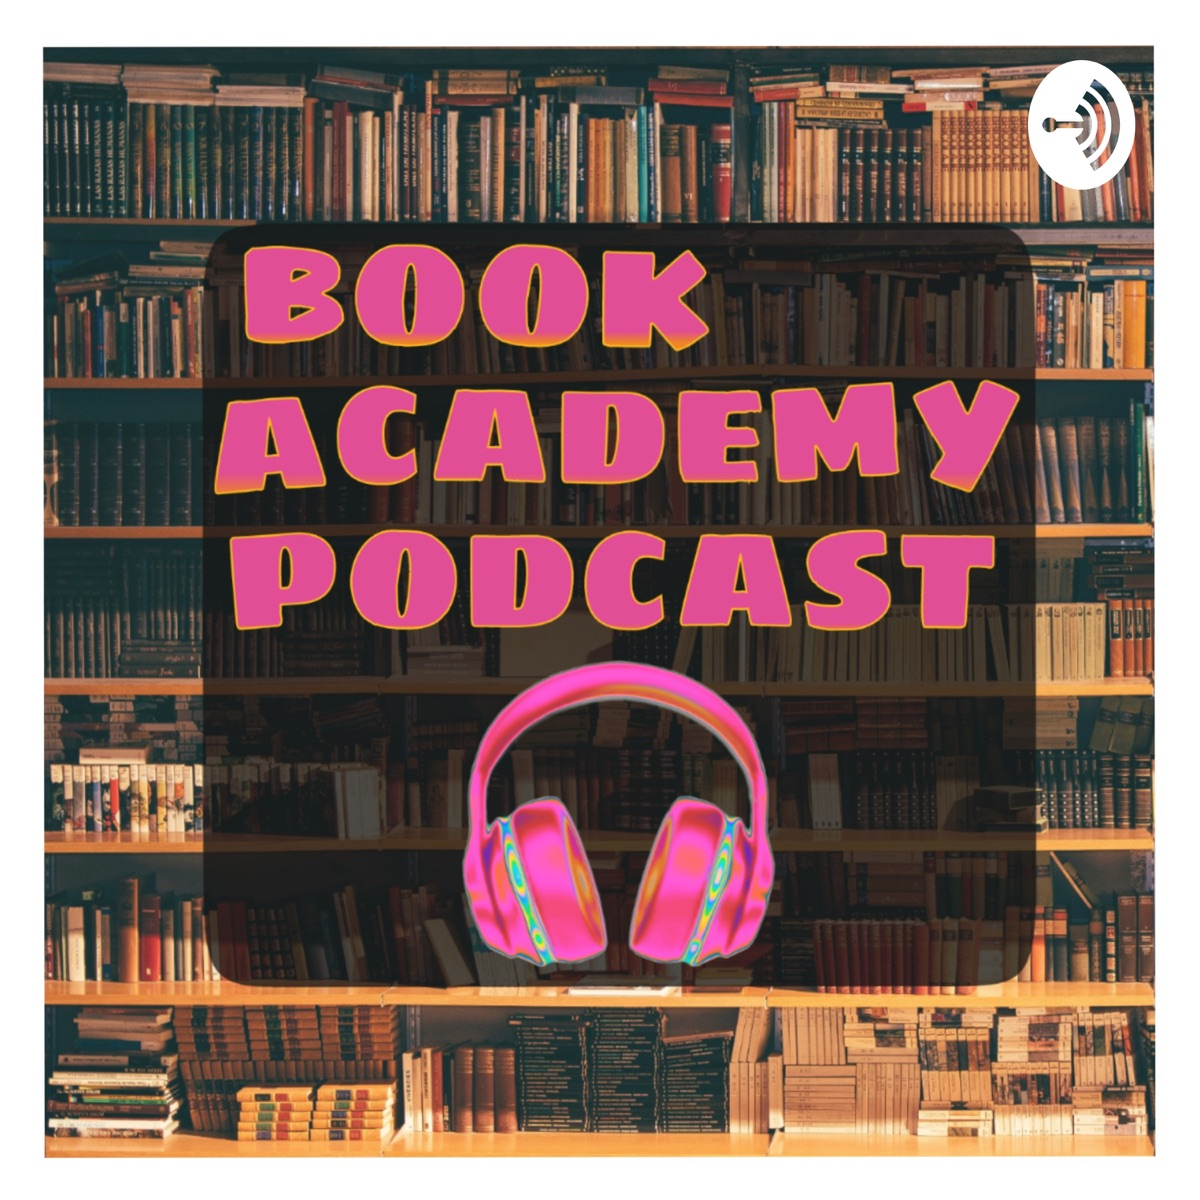 Book Academy Podcast